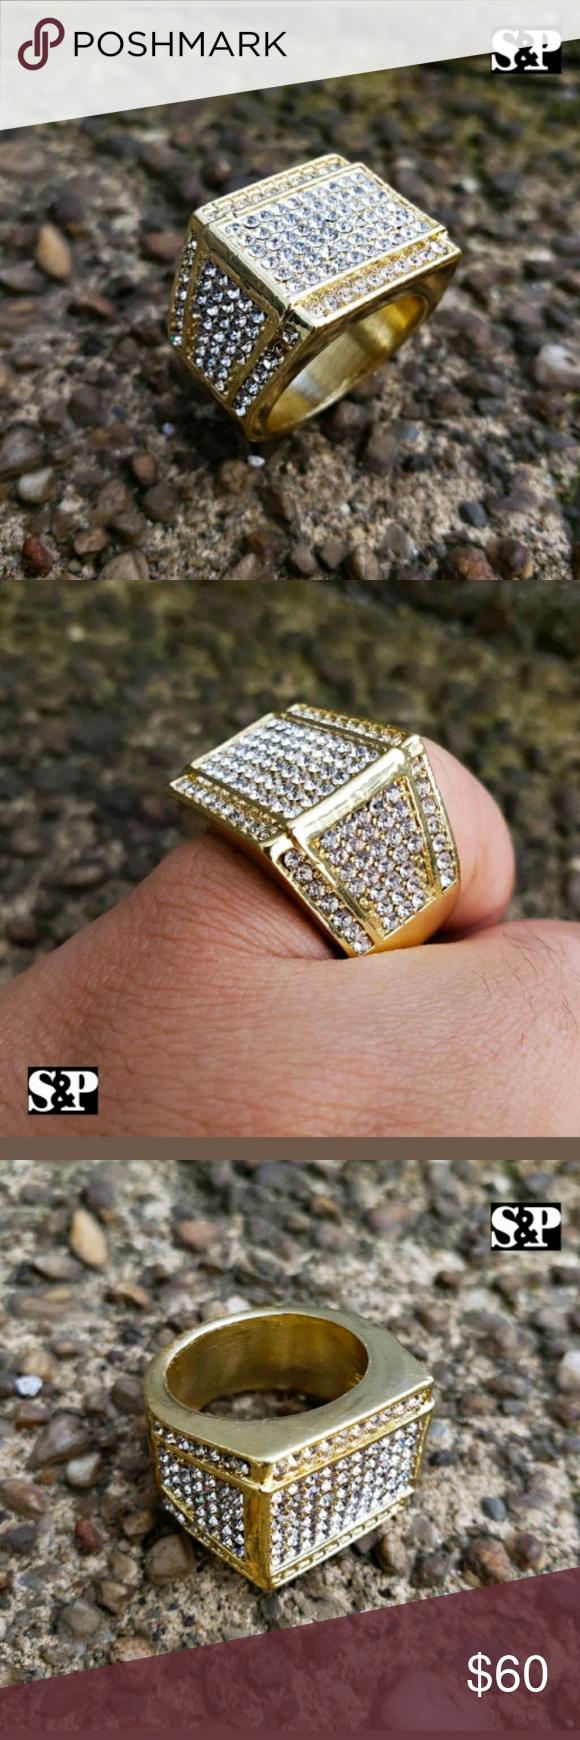 Menus hip hop ring mens iced out hip hop luxury migos lab diamond